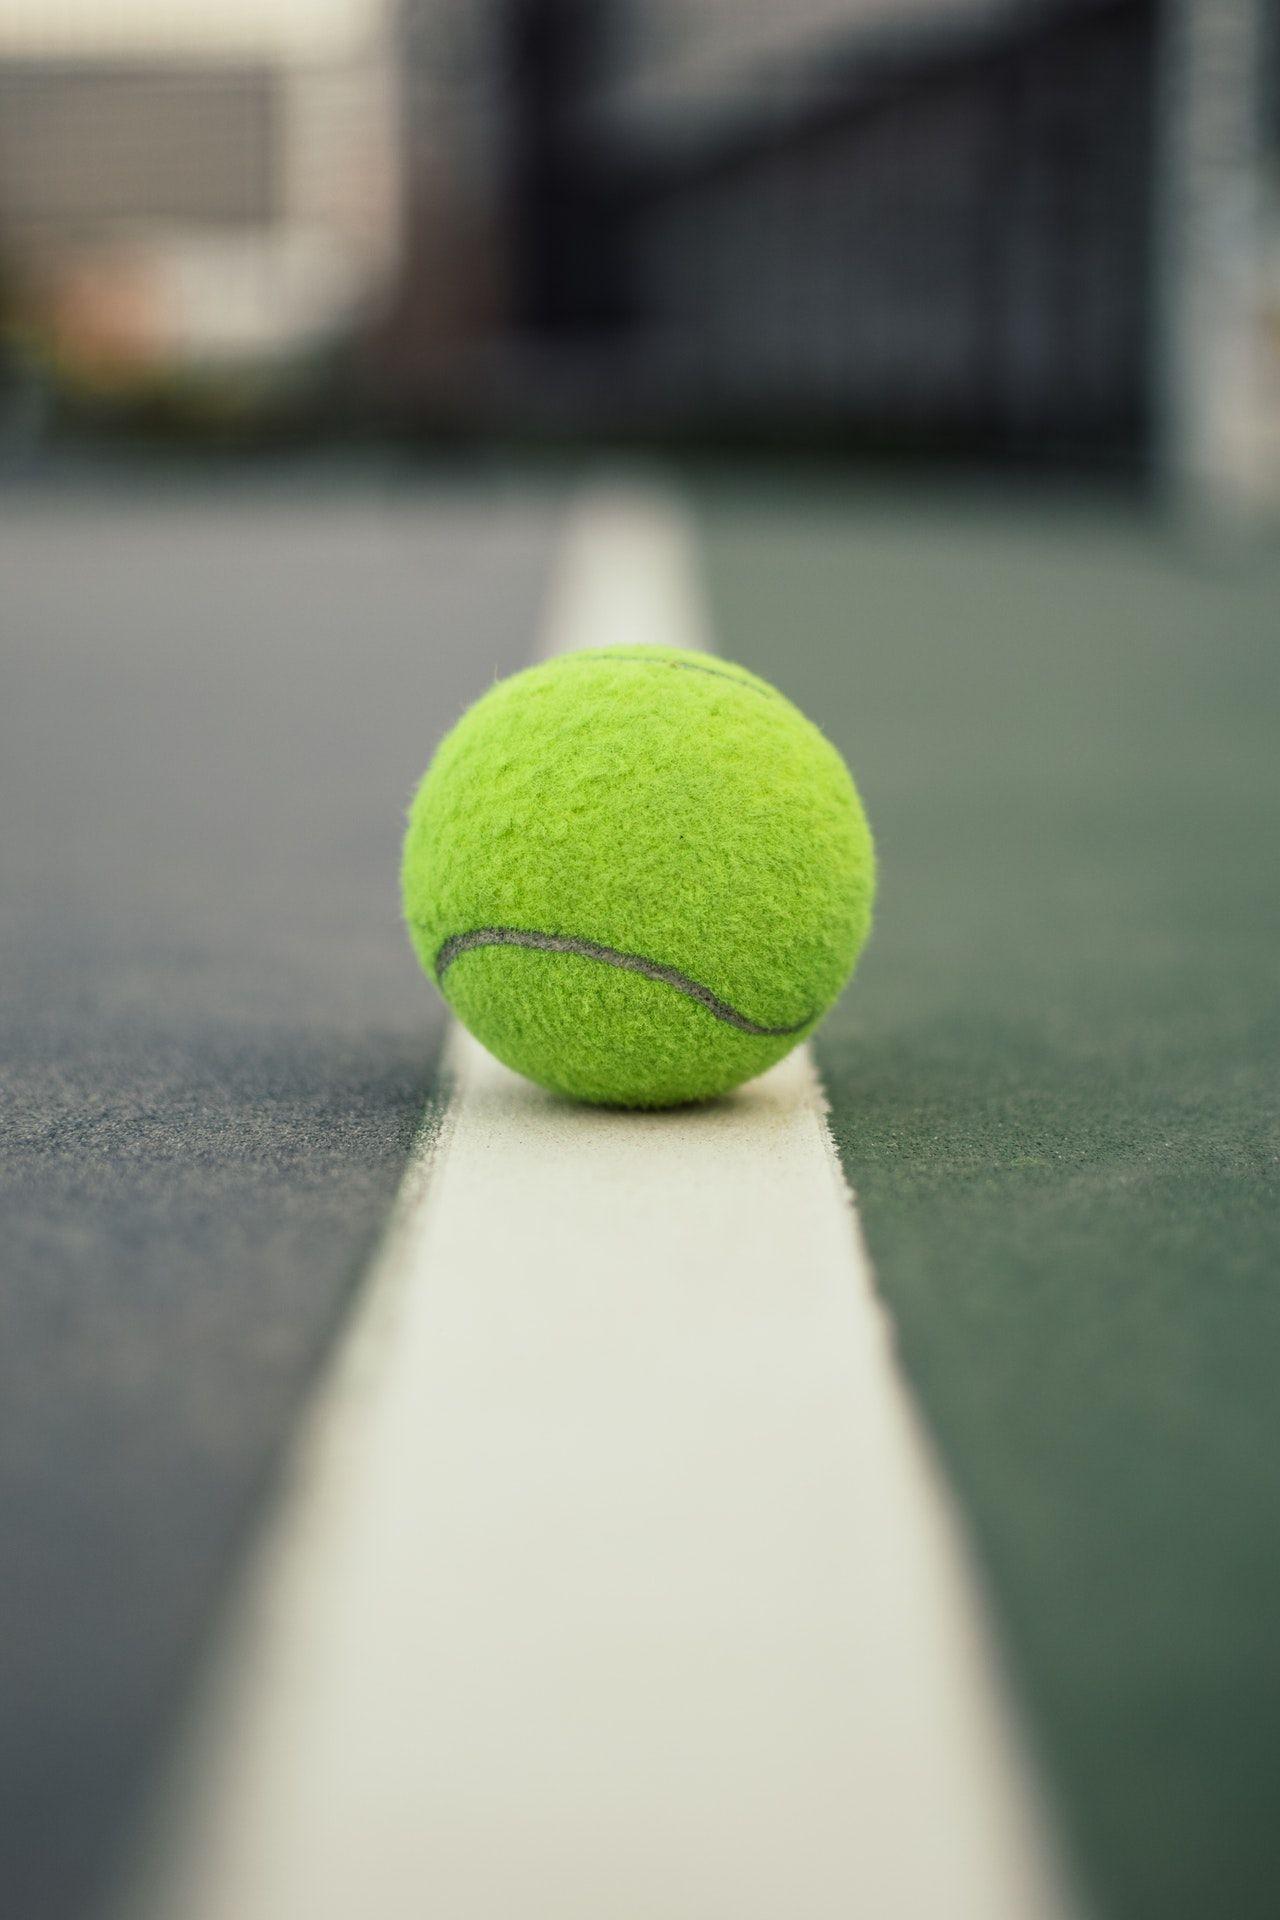 Penn Championship High Altitude Tennis Balls In 2020 Tennis Tennis Wallpaper Tennis Ball